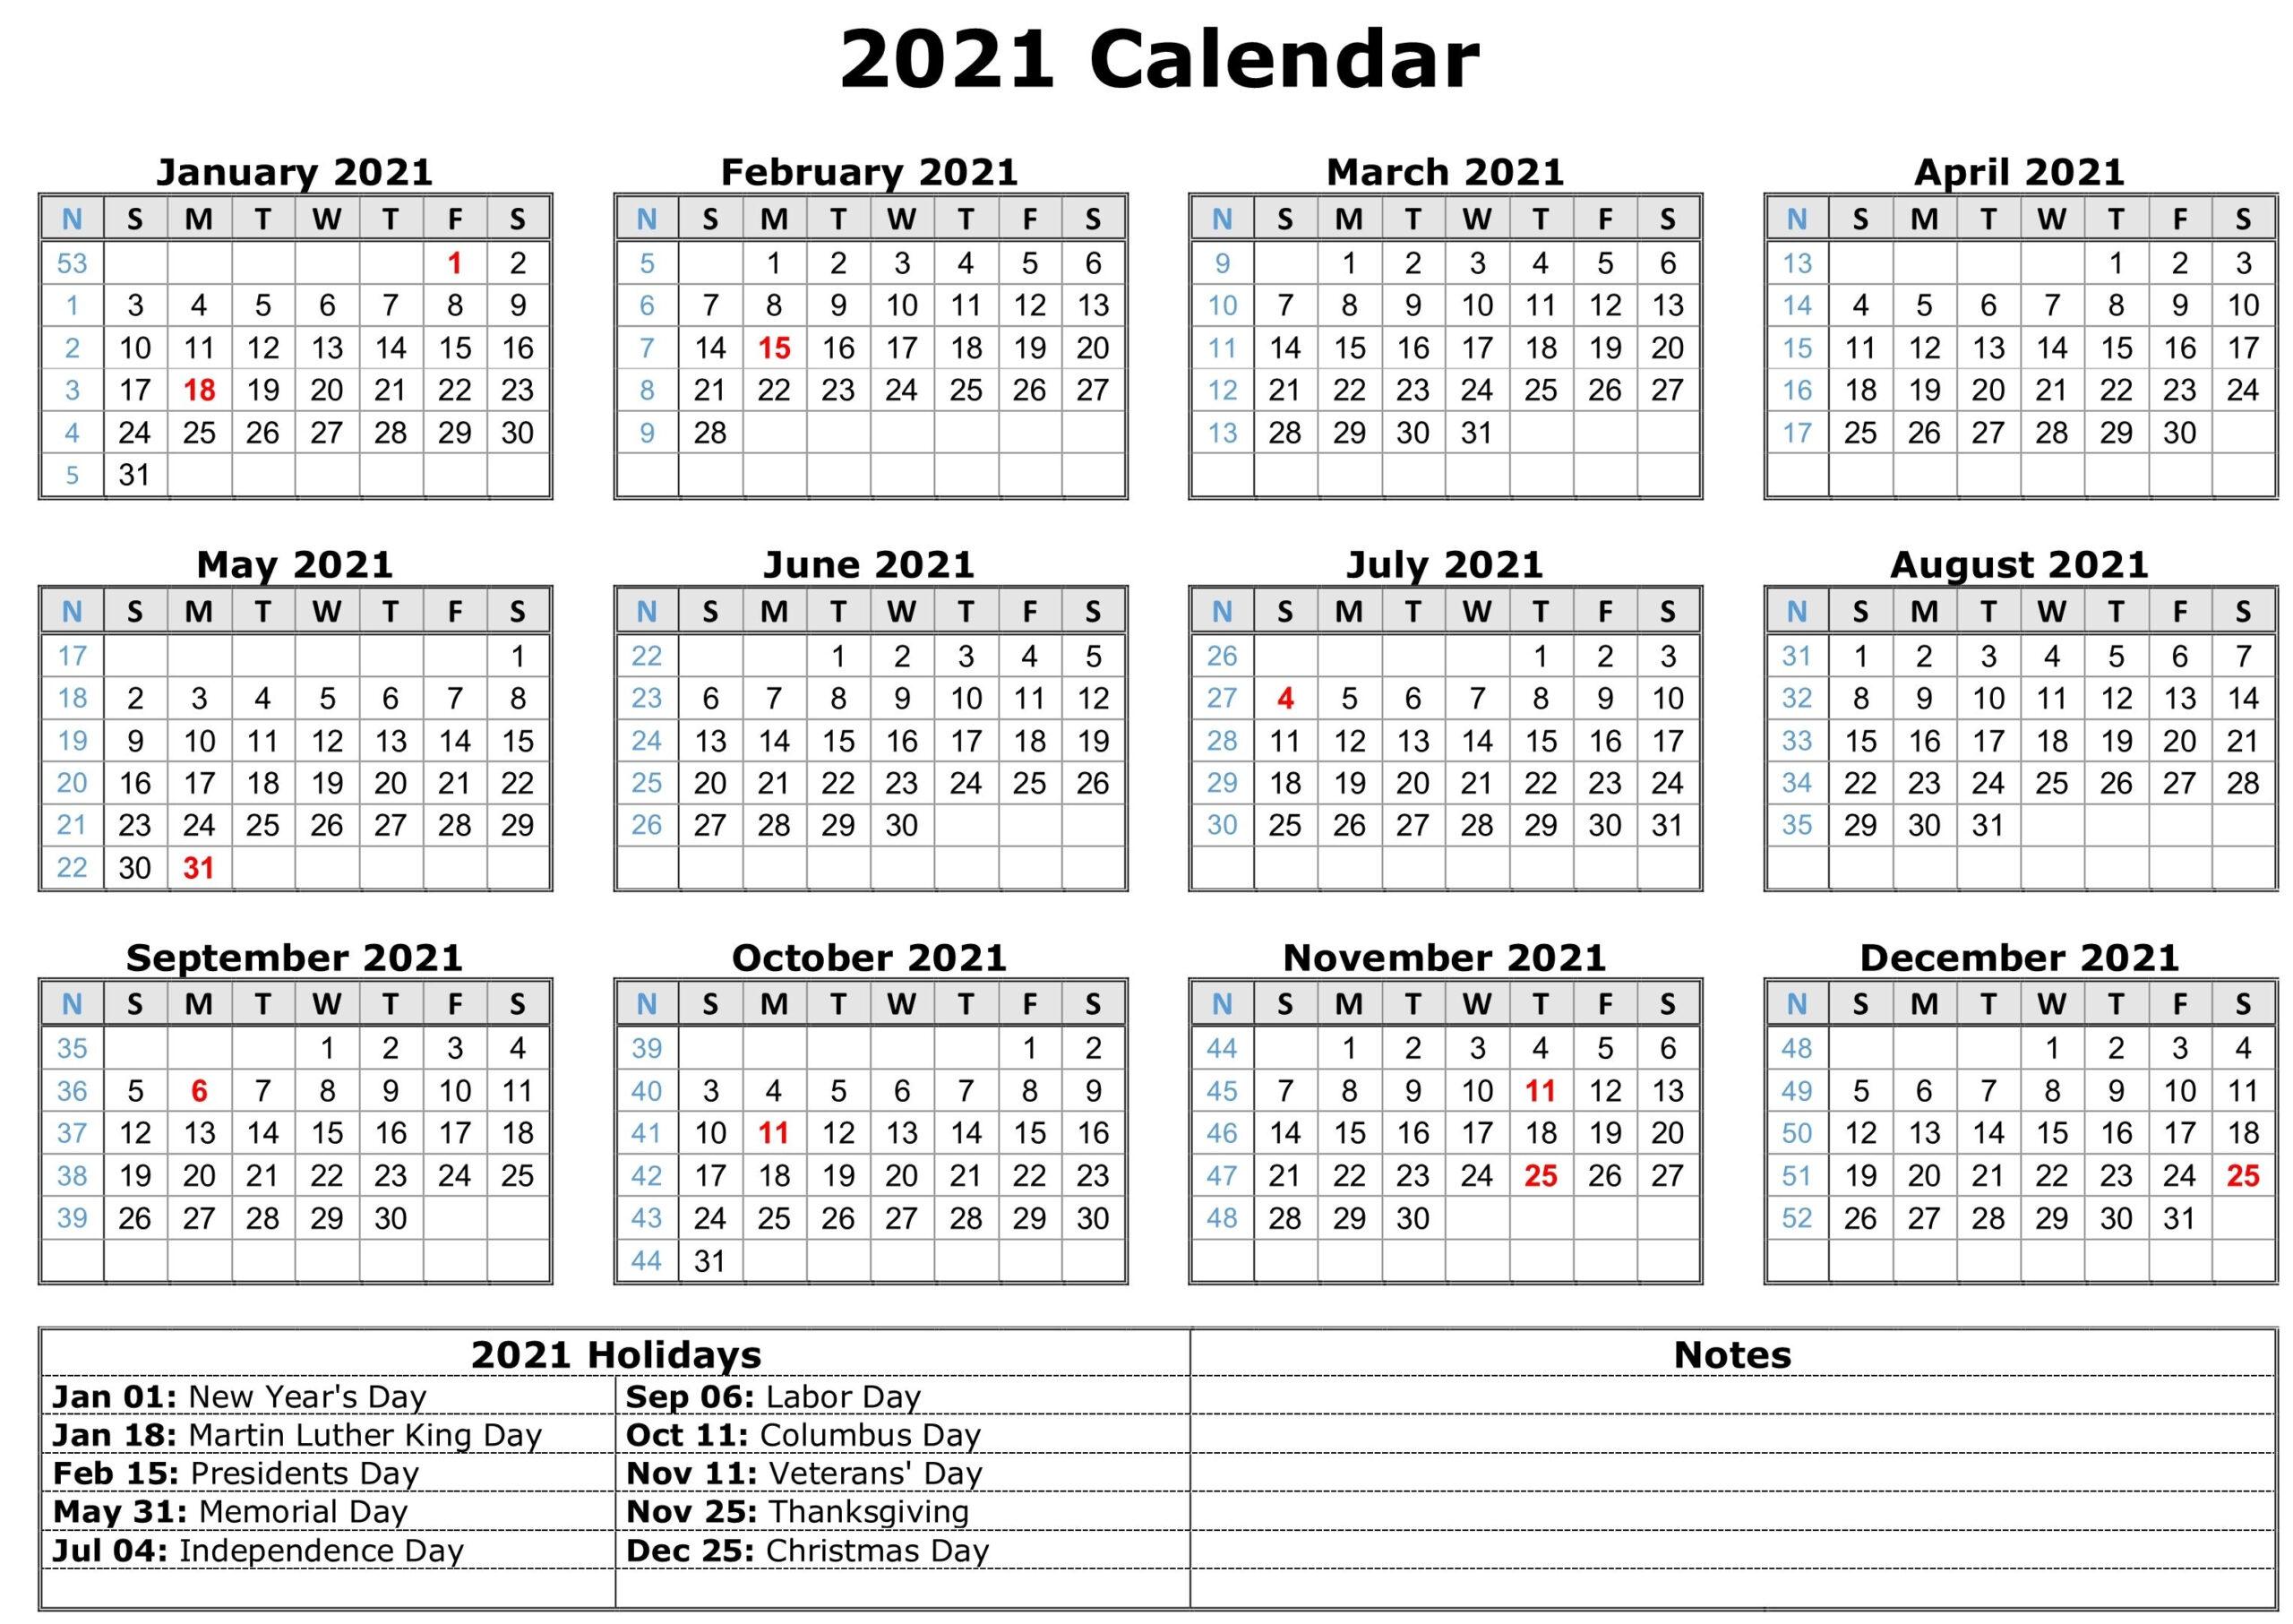 2021 Calendar With Holidays | Free Calendar Template intended for Depo Calendar 2021 Pdf